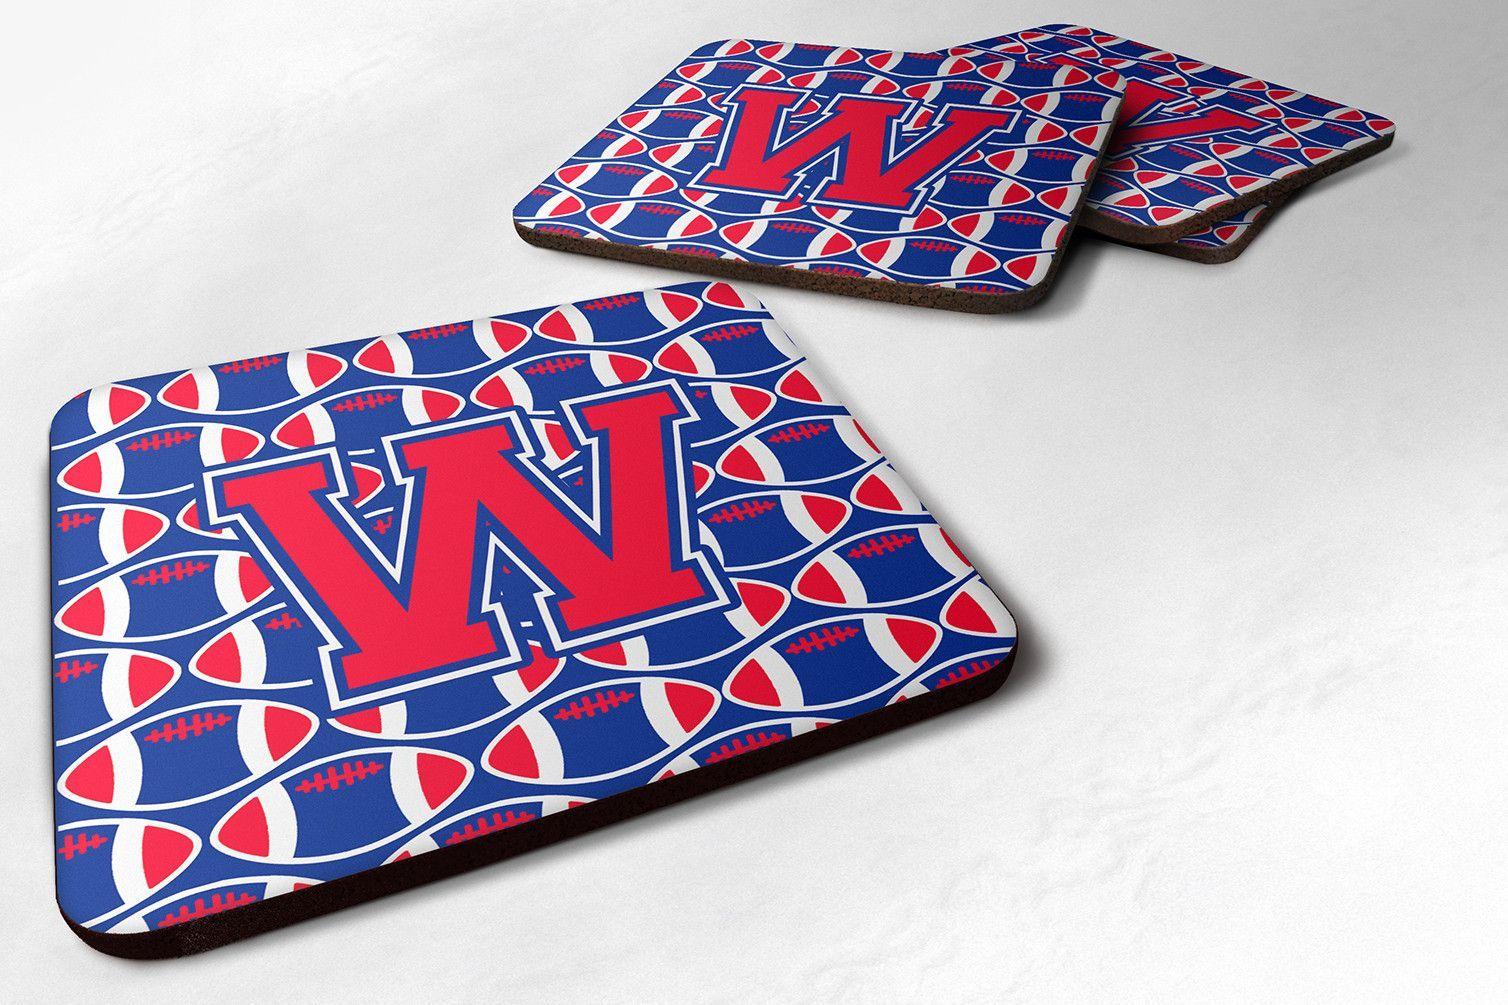 Letter W Football Harvard Crimson and Yale Blue Foam Coaster Set of 4 CJ1076-WFC